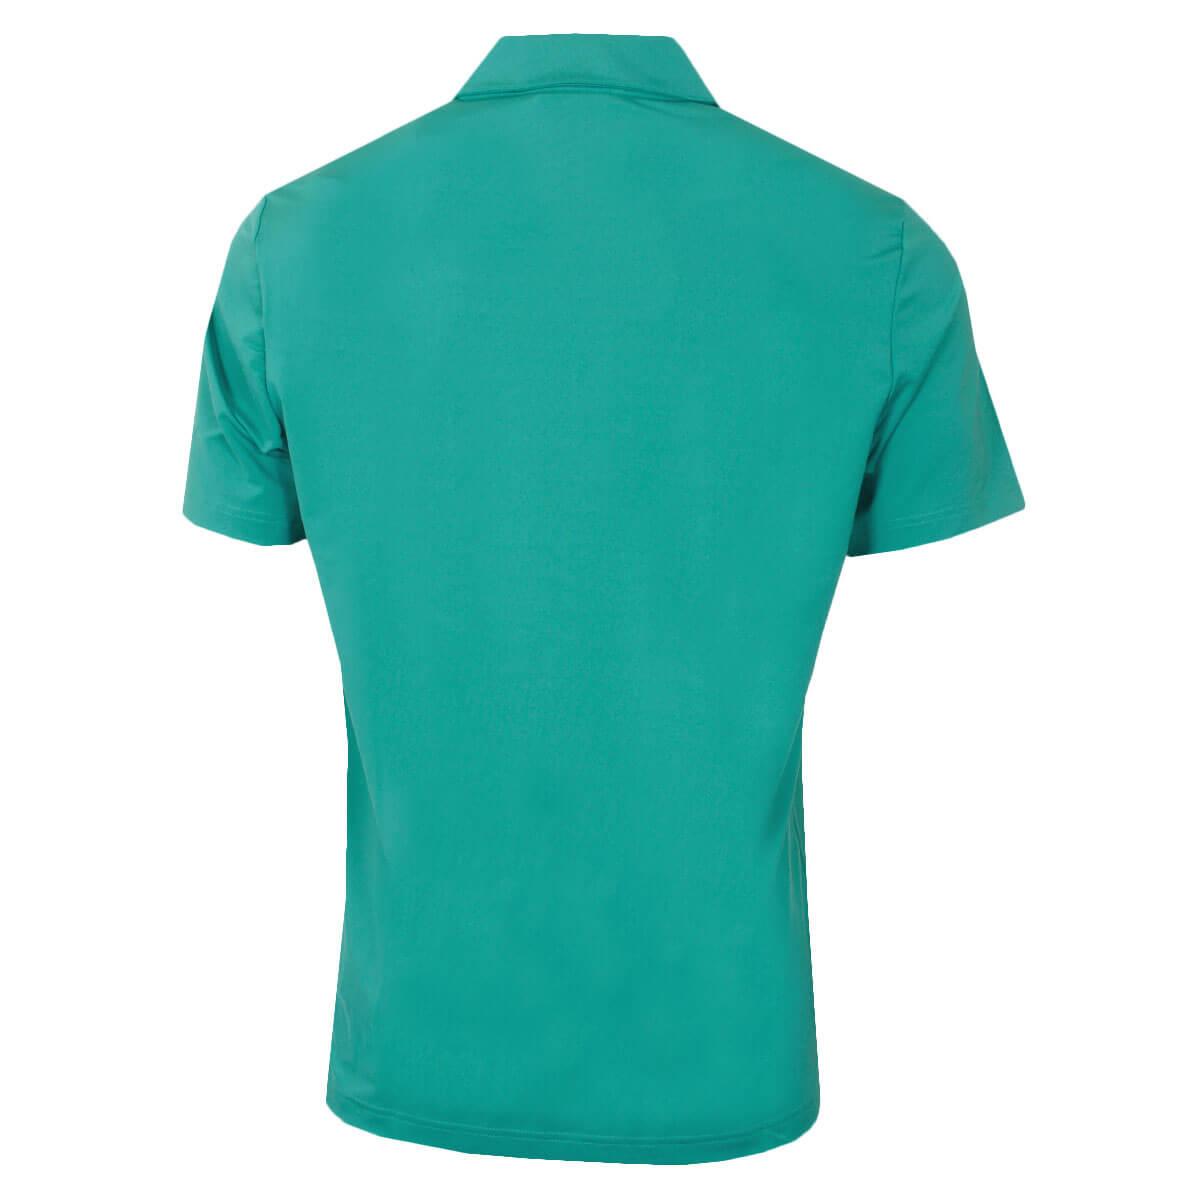 Adidas-Golf-Men-039-s-Ultimate-2-0-Solid-Crestable-Polo-Shirt thumbnail 13